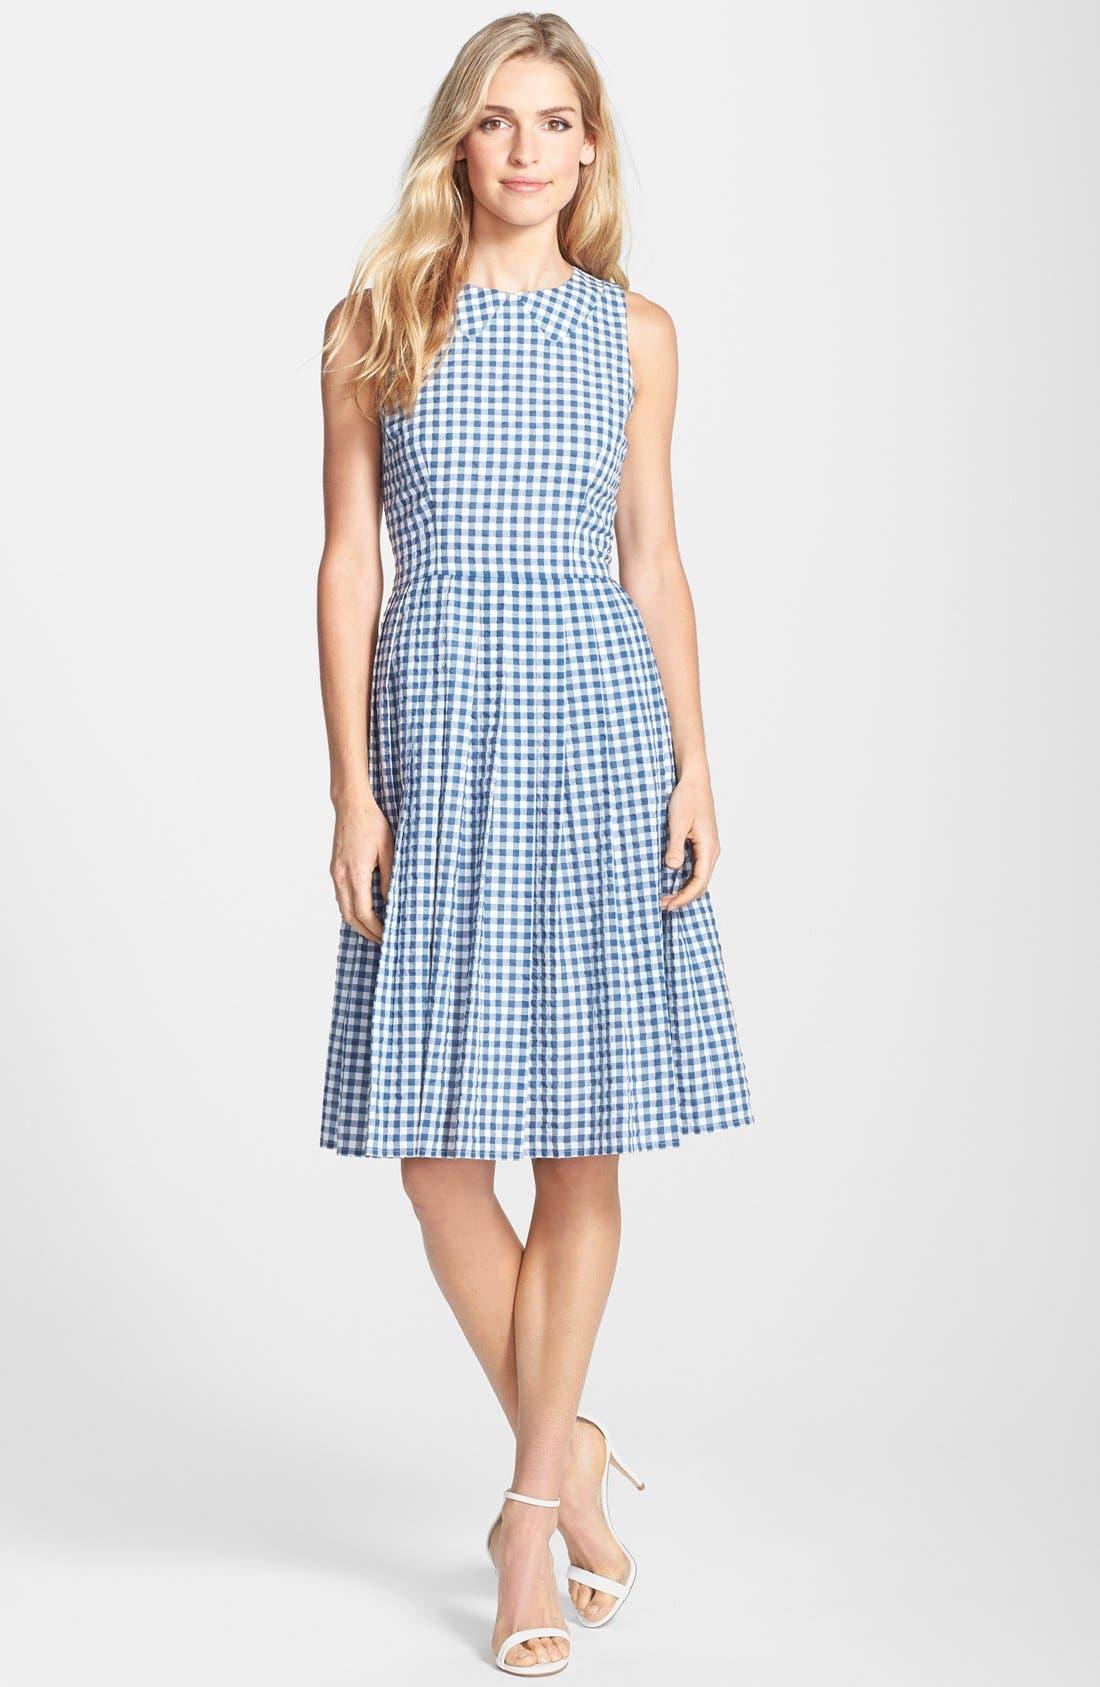 Main Image - Kaya & Sloane Gingham Cotton Fit & Flare Midi Dress